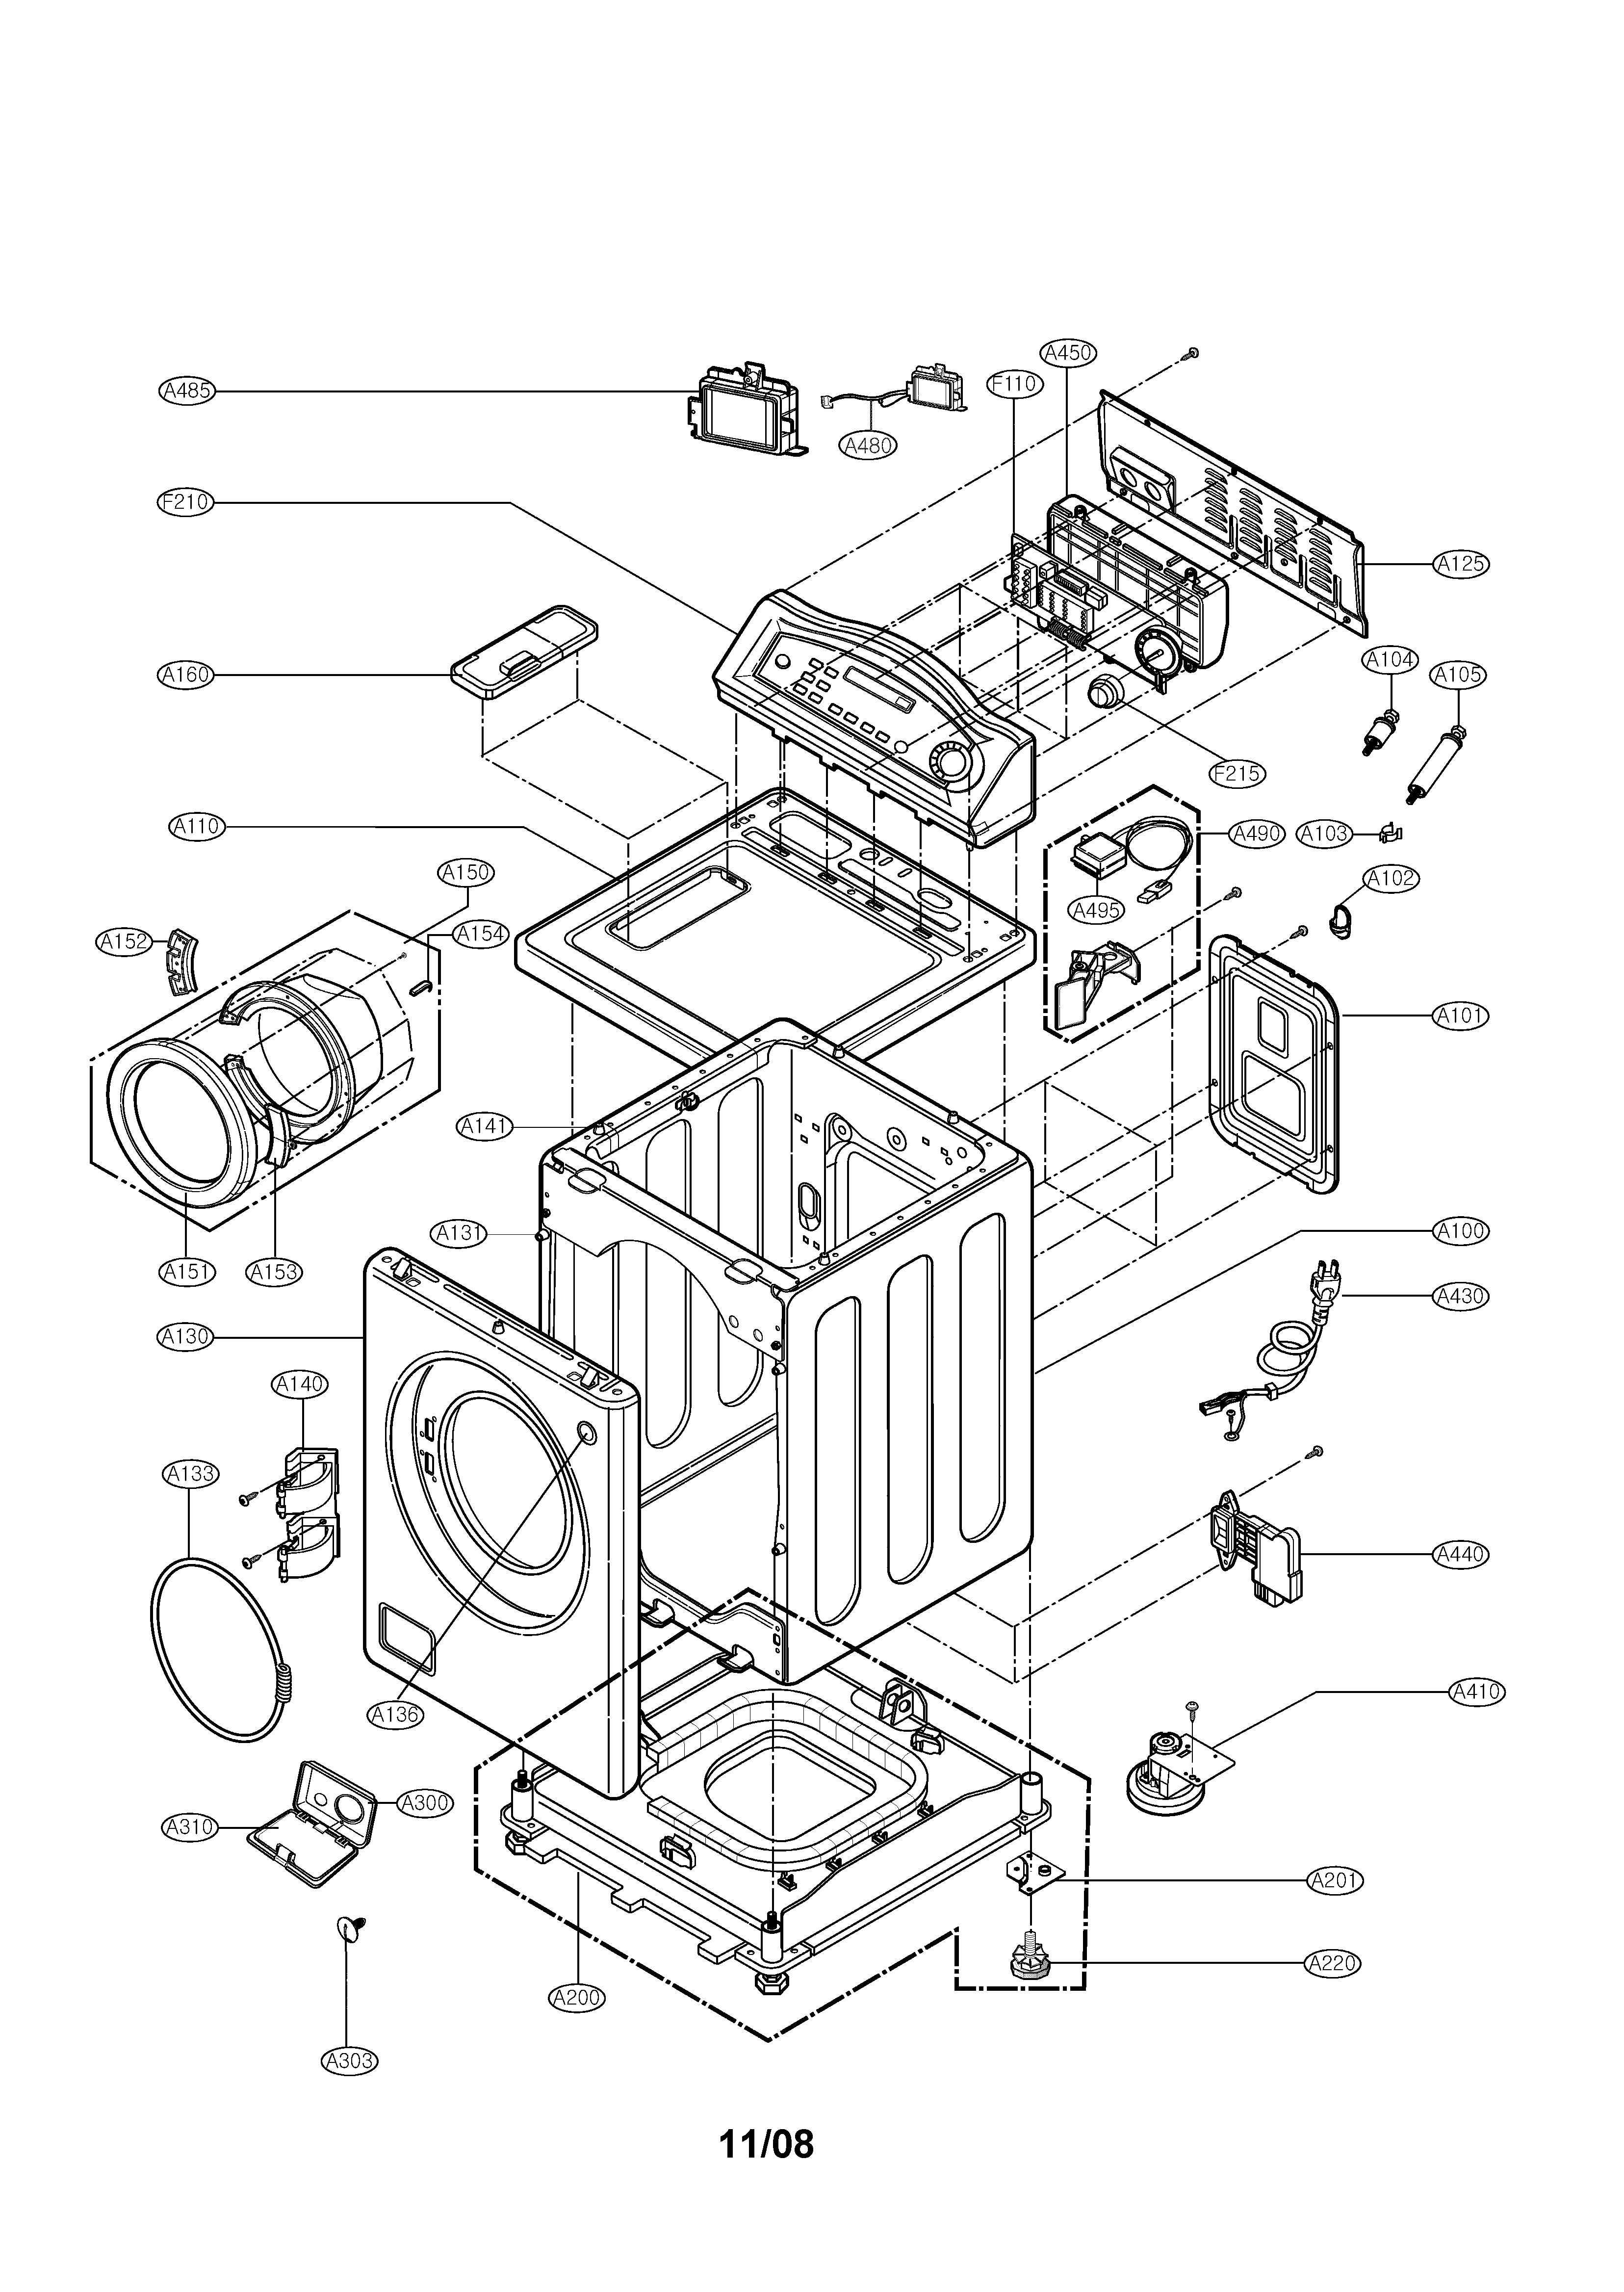 2003 chevy tahoe interior door diagram html